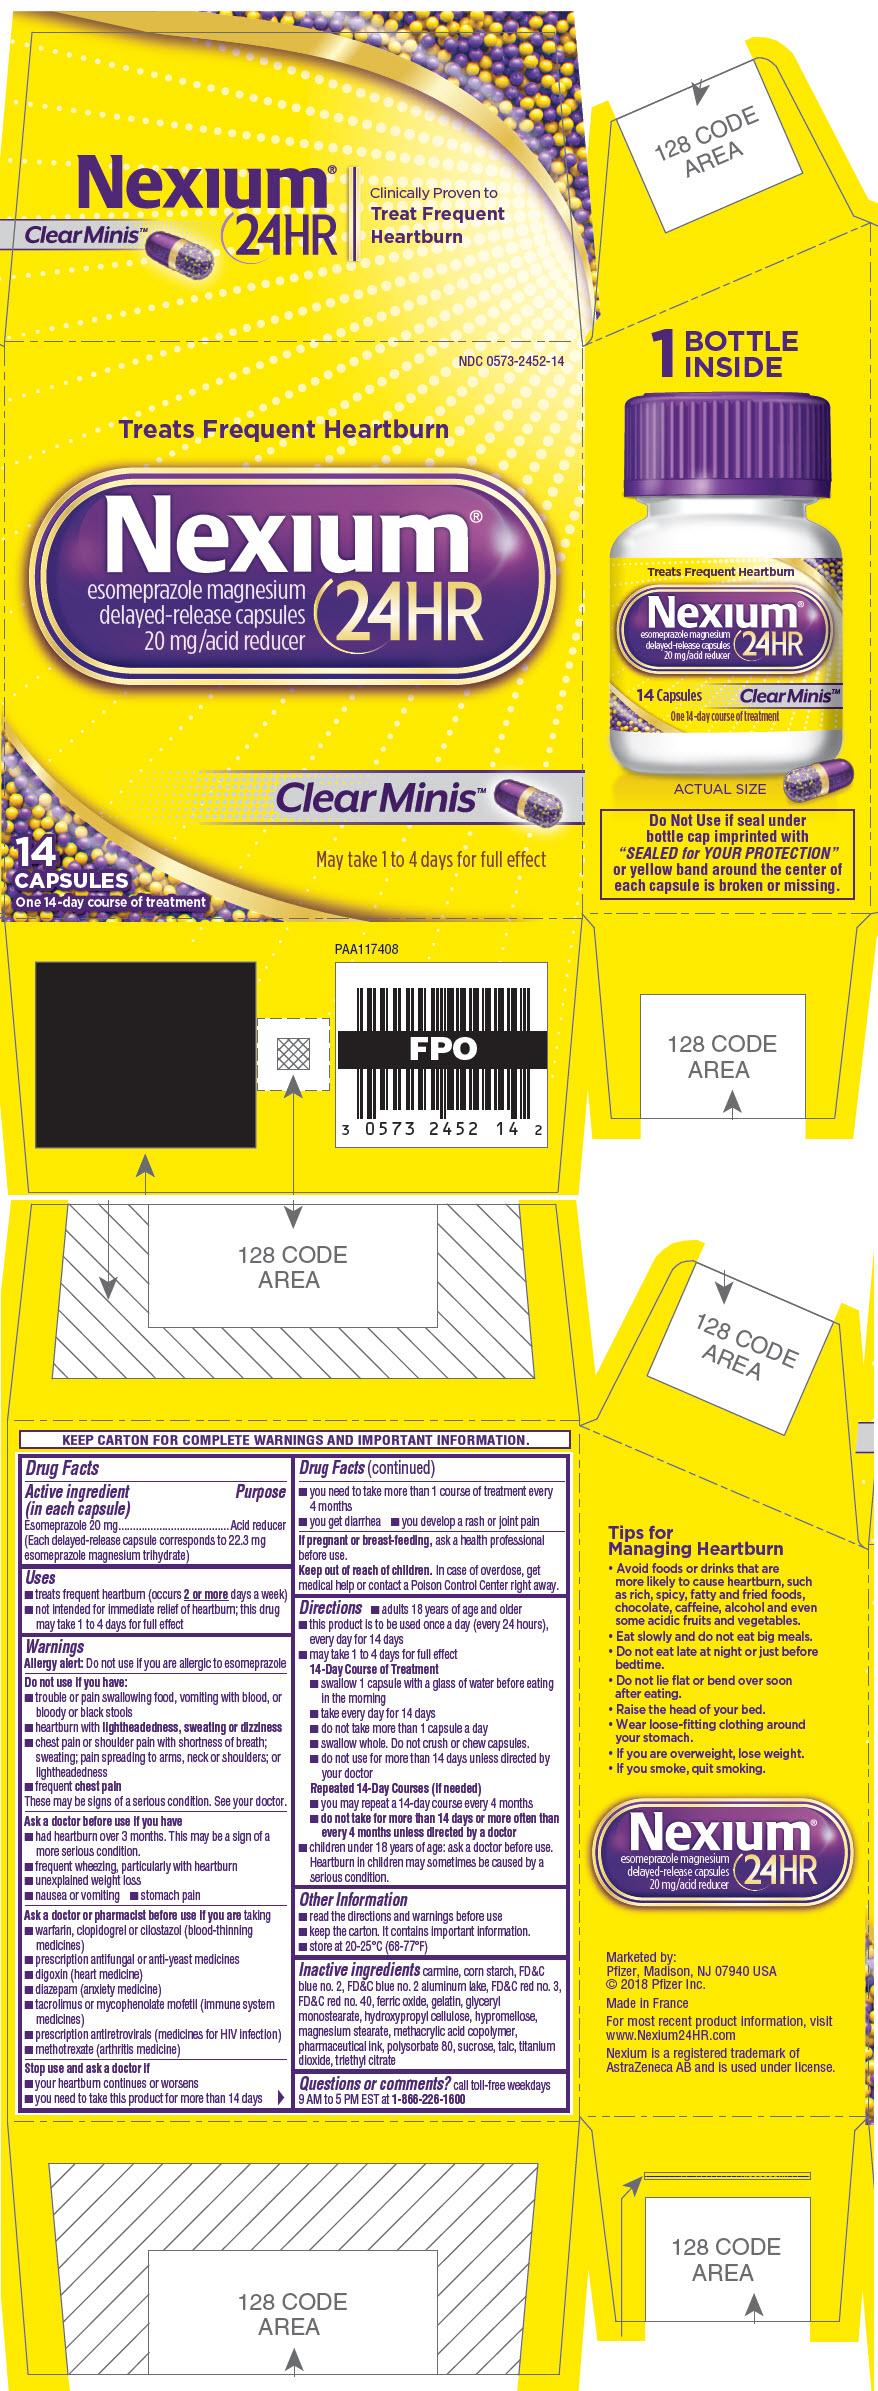 PRINCIPAL DISPLAY PANEL - 14 Capsule Bottle Carton - Clear Minis